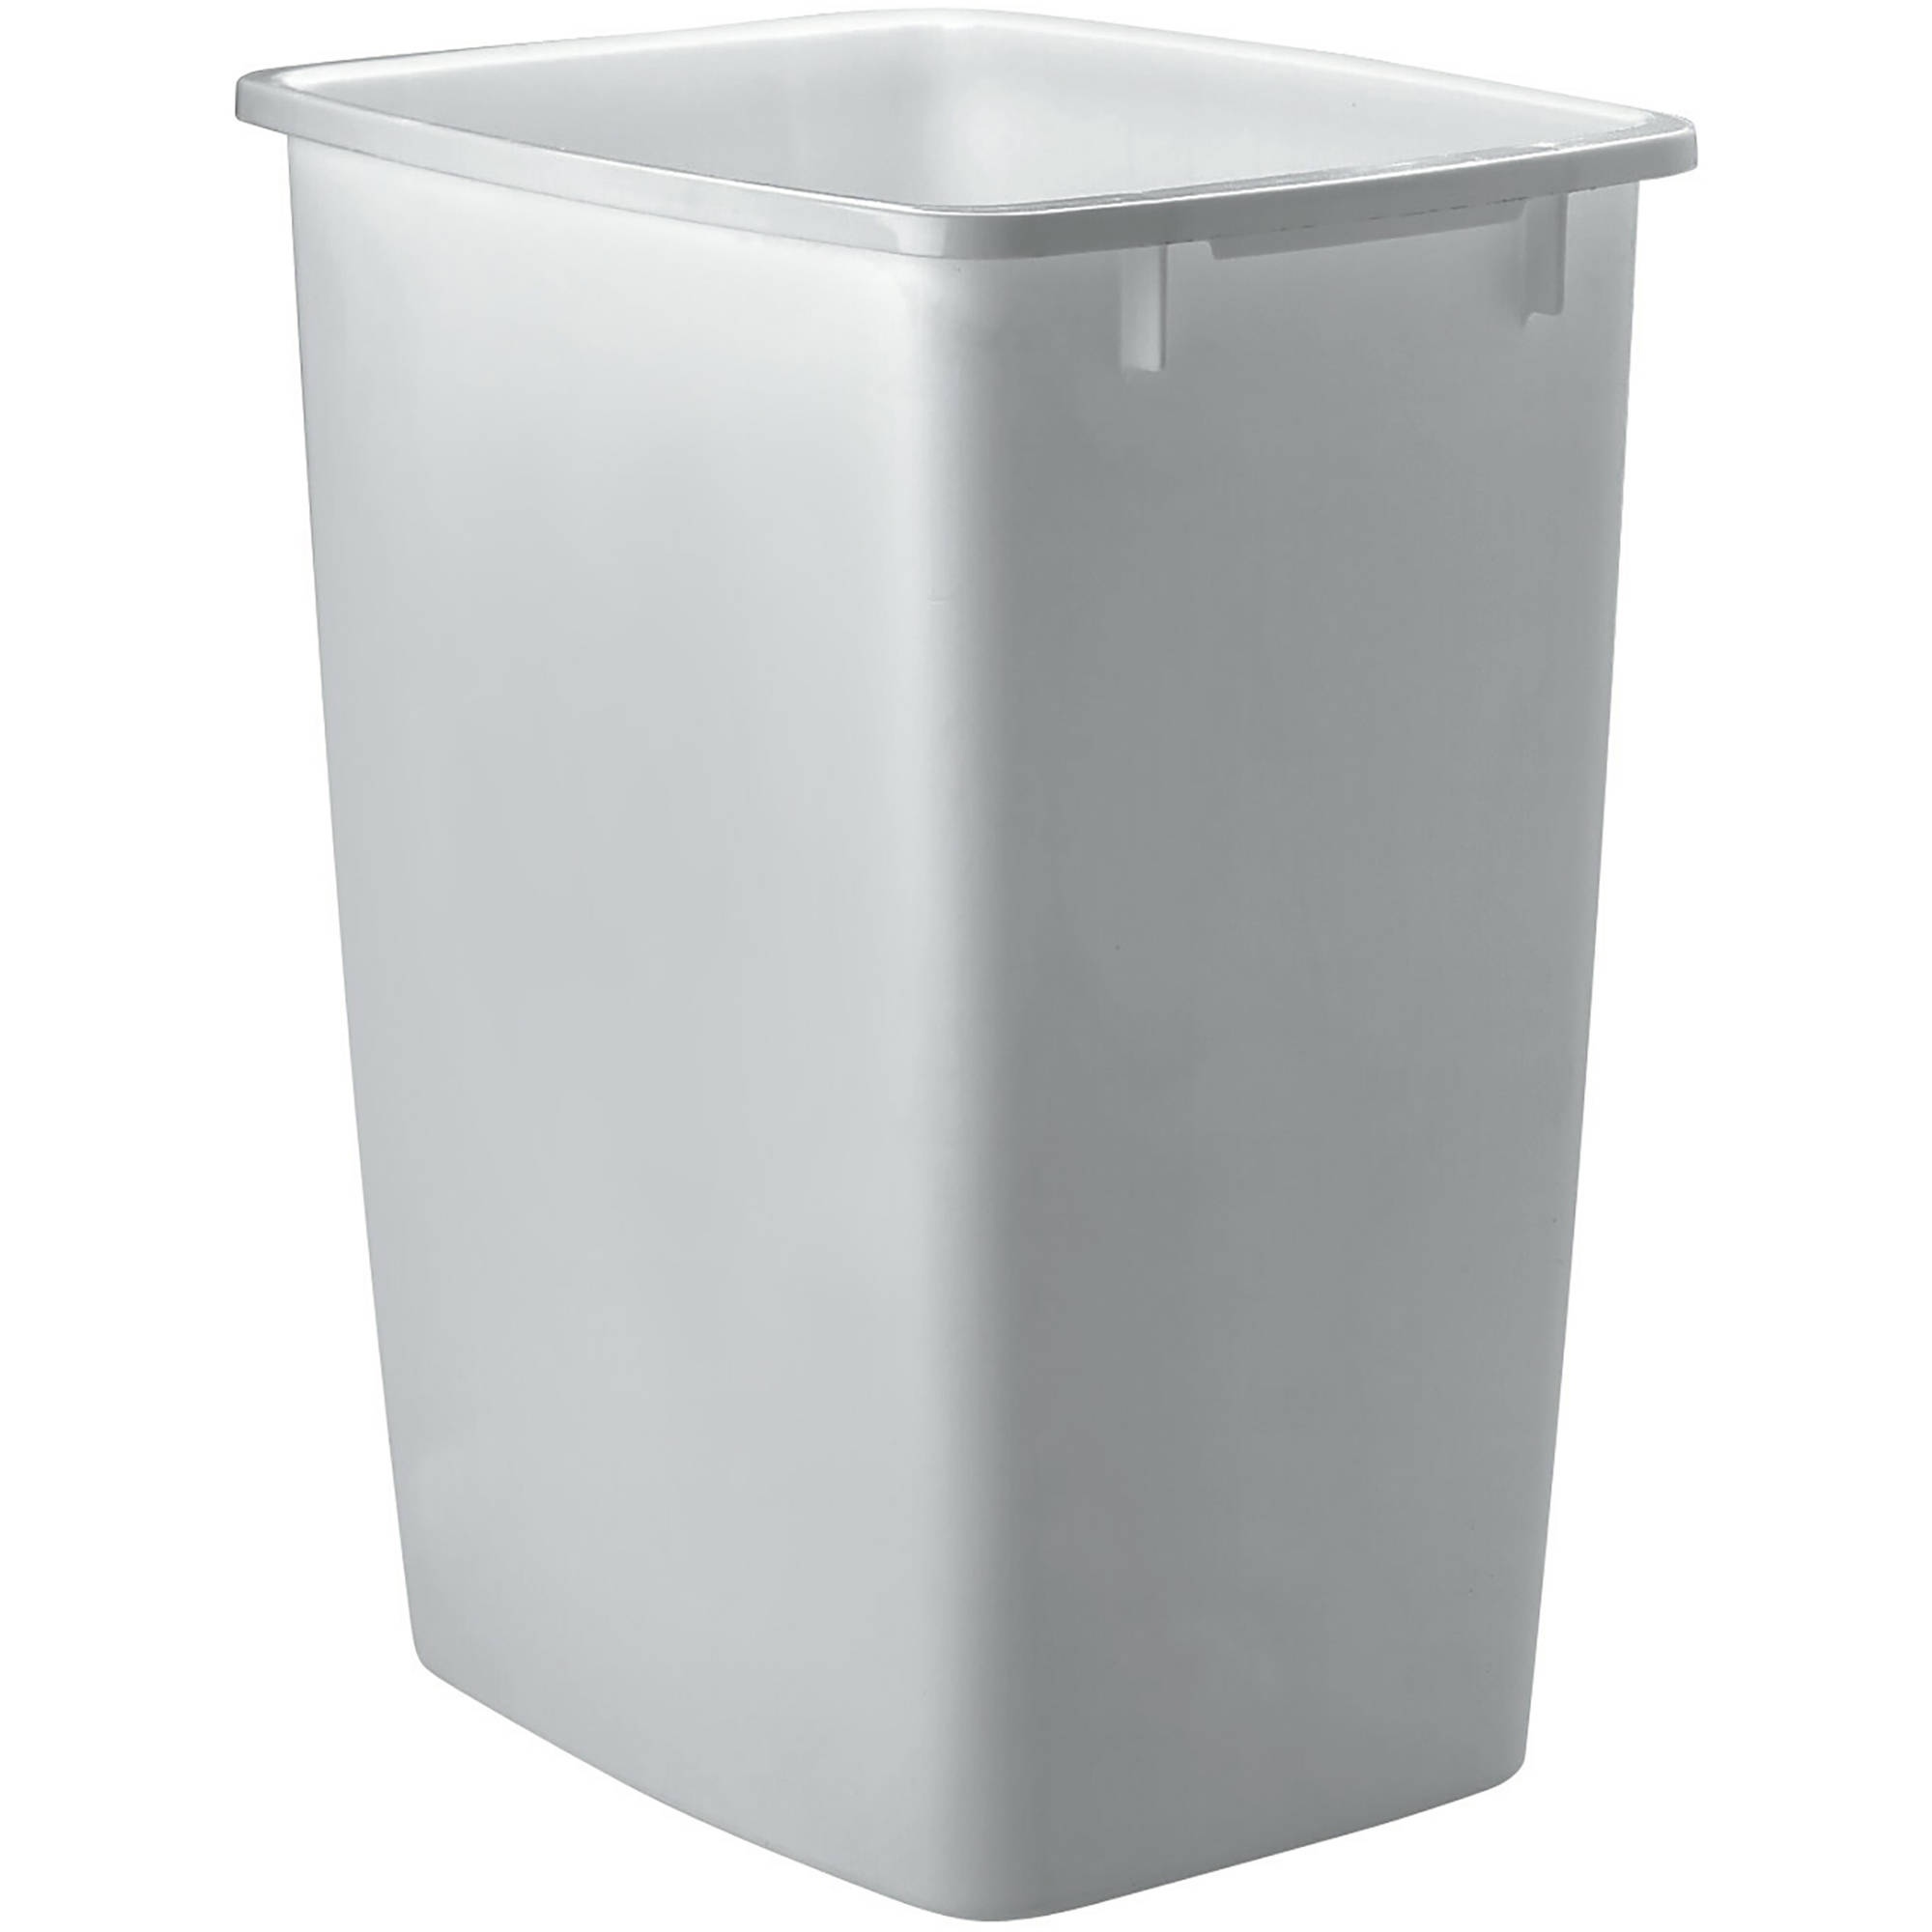 Tall Kitchen Trash Can